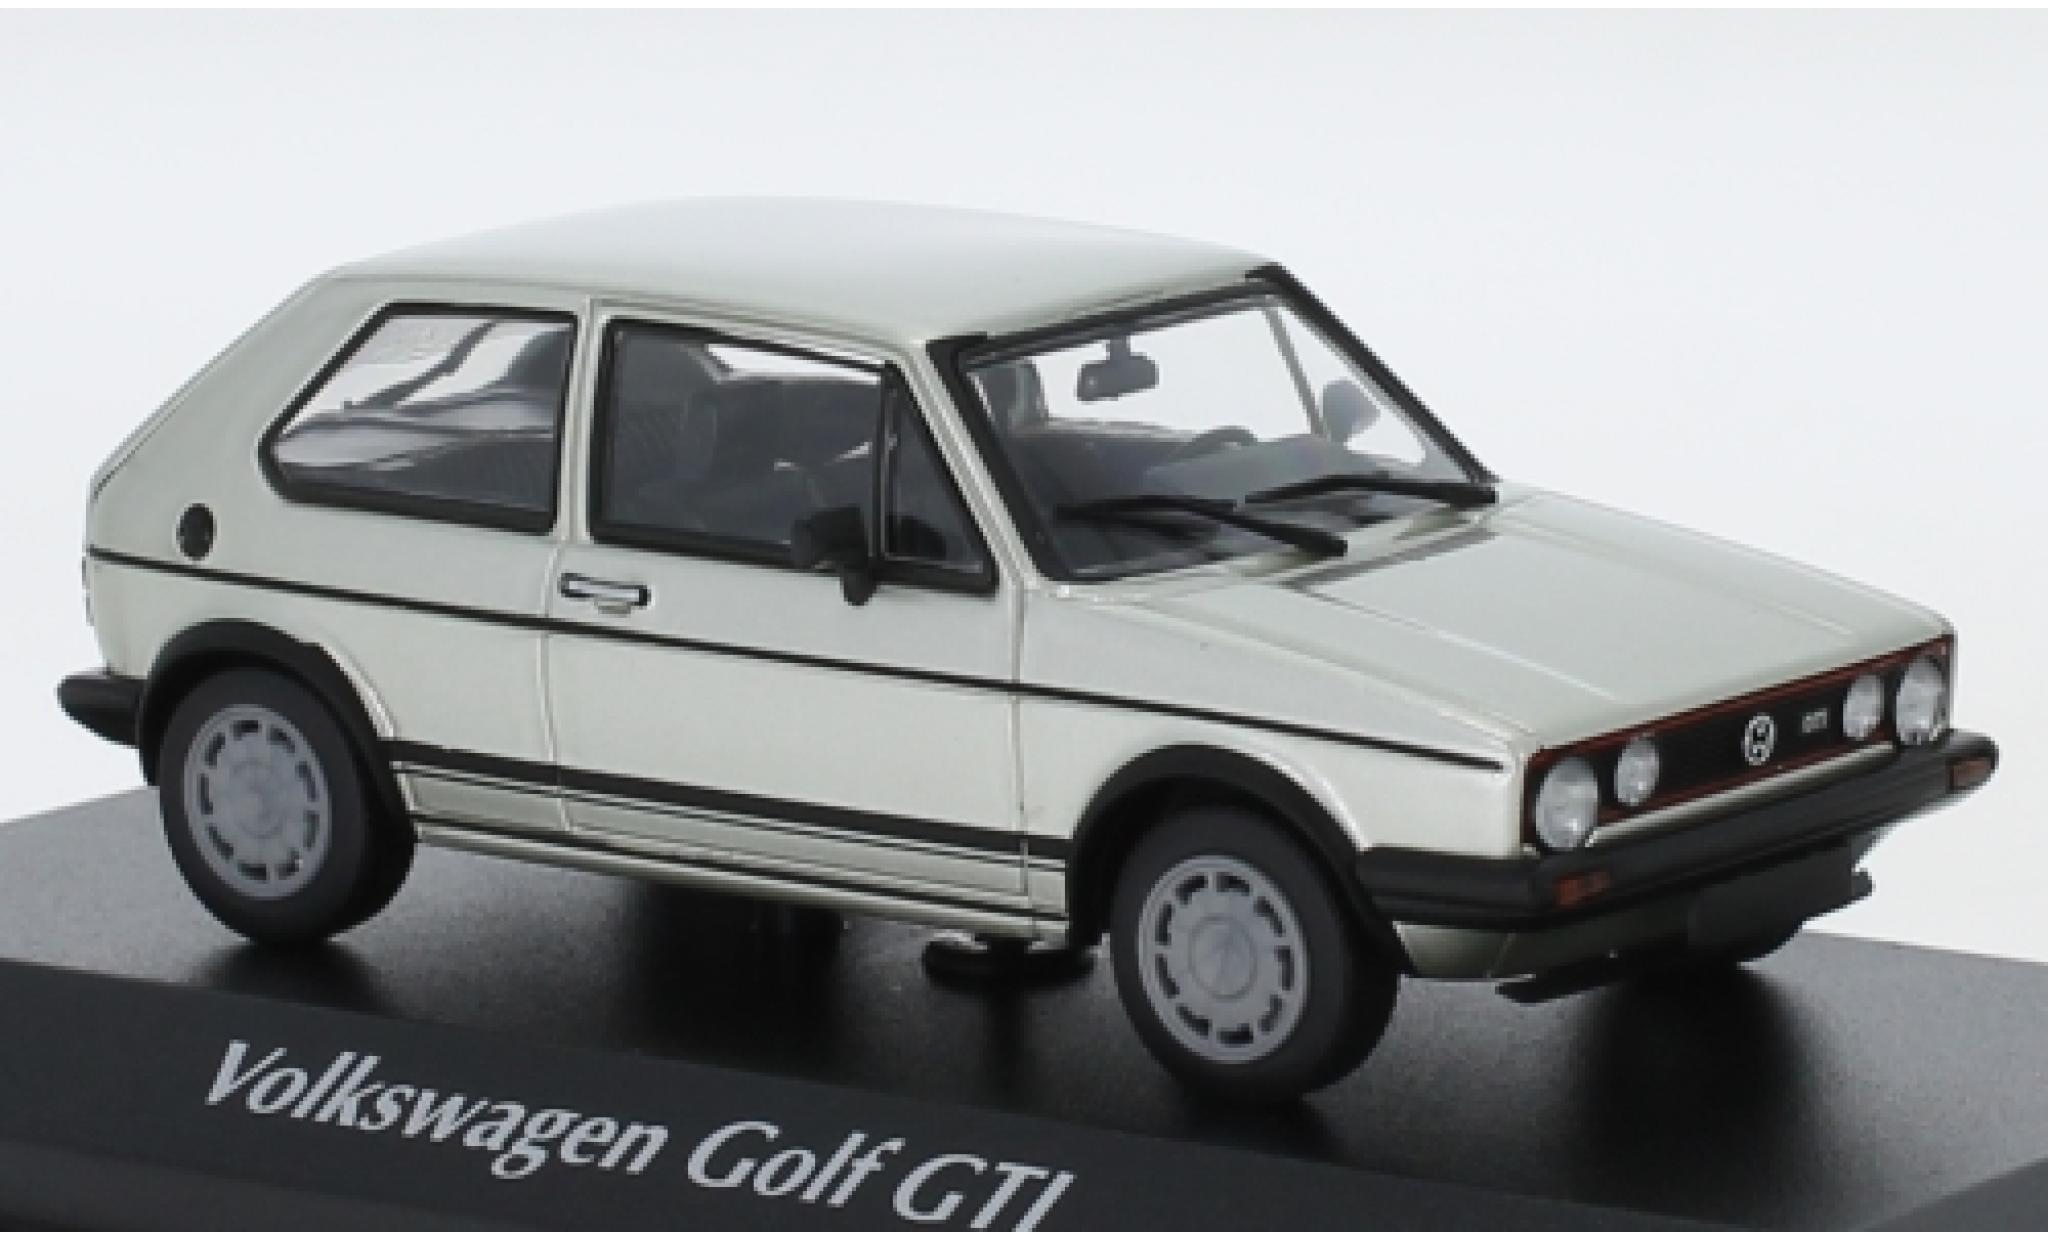 Volkswagen Golf 1/43 Maxichamps I GTI grise 1983